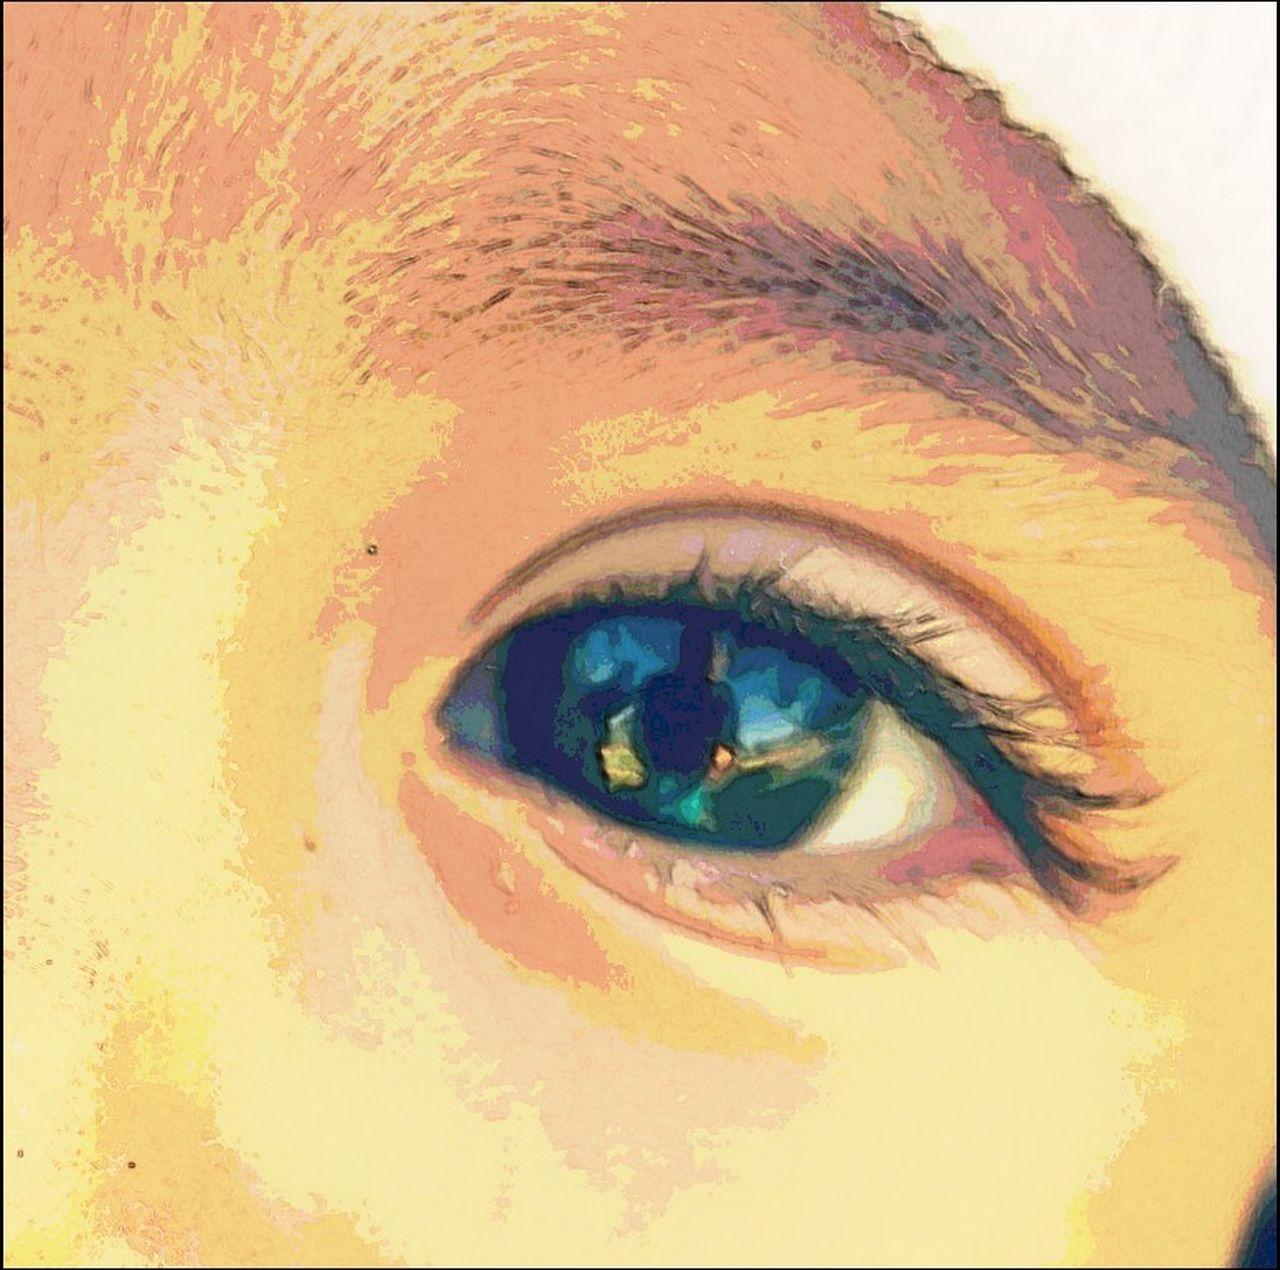 human eye, human body part, eyelash, eyesight, close-up, eyeball, one person, portrait, iris - eye, real people, sensory perception, looking at camera, full frame, human face, eyebrow, backgrounds, day, outdoors, people